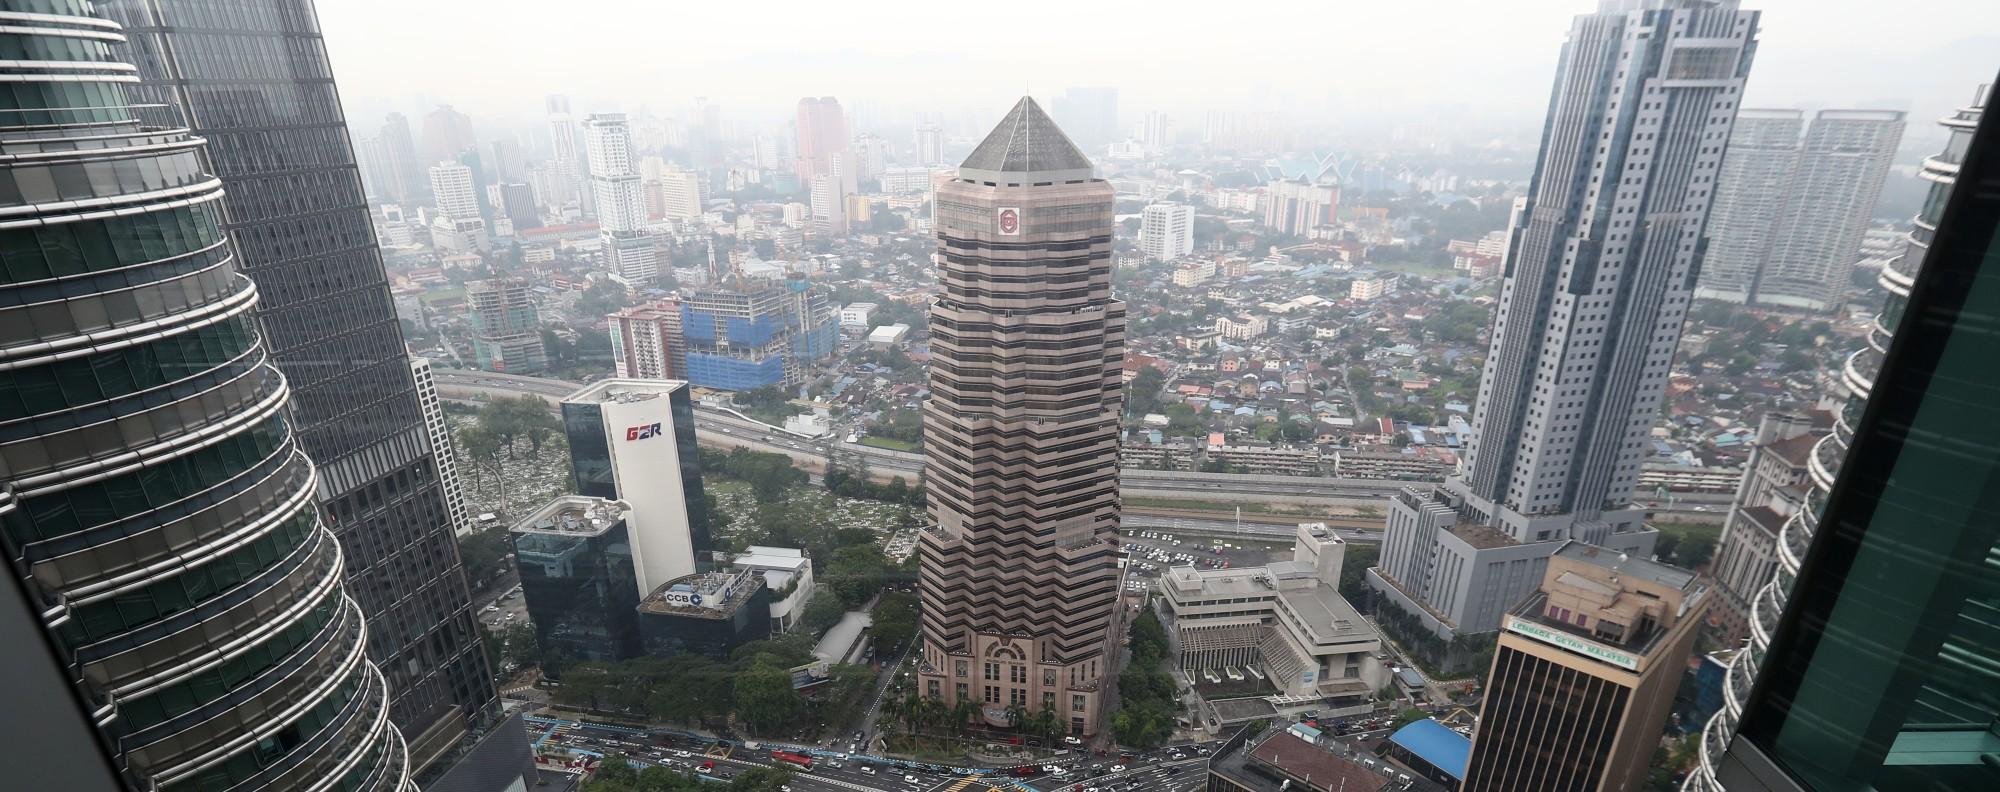 The Kuala Lumpur skyline. Photo: SCMP